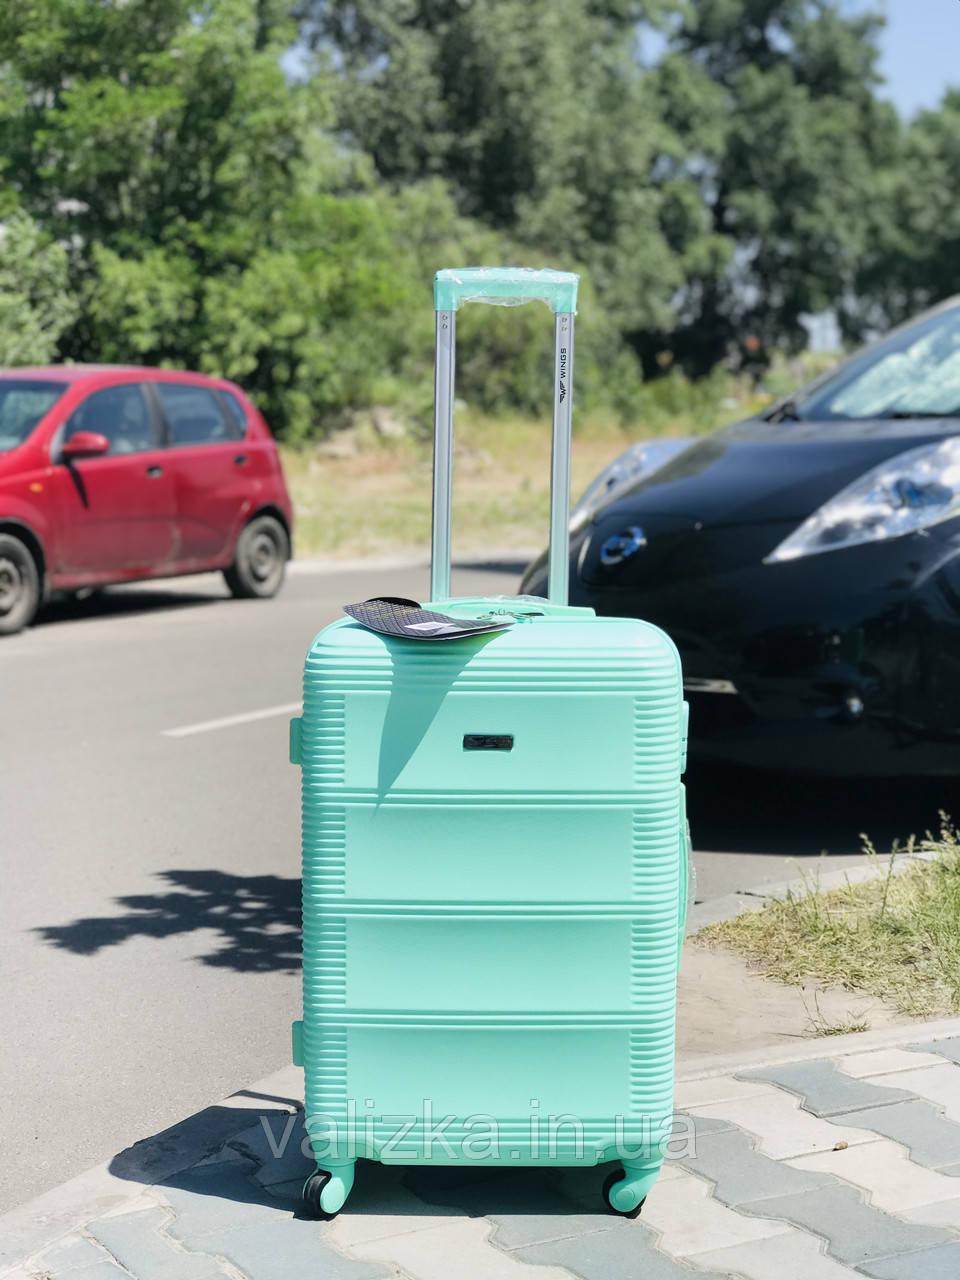 Средний пластиковый чемодан мятный бирюзовый на 4-х колесах / Середня пластикова валіза